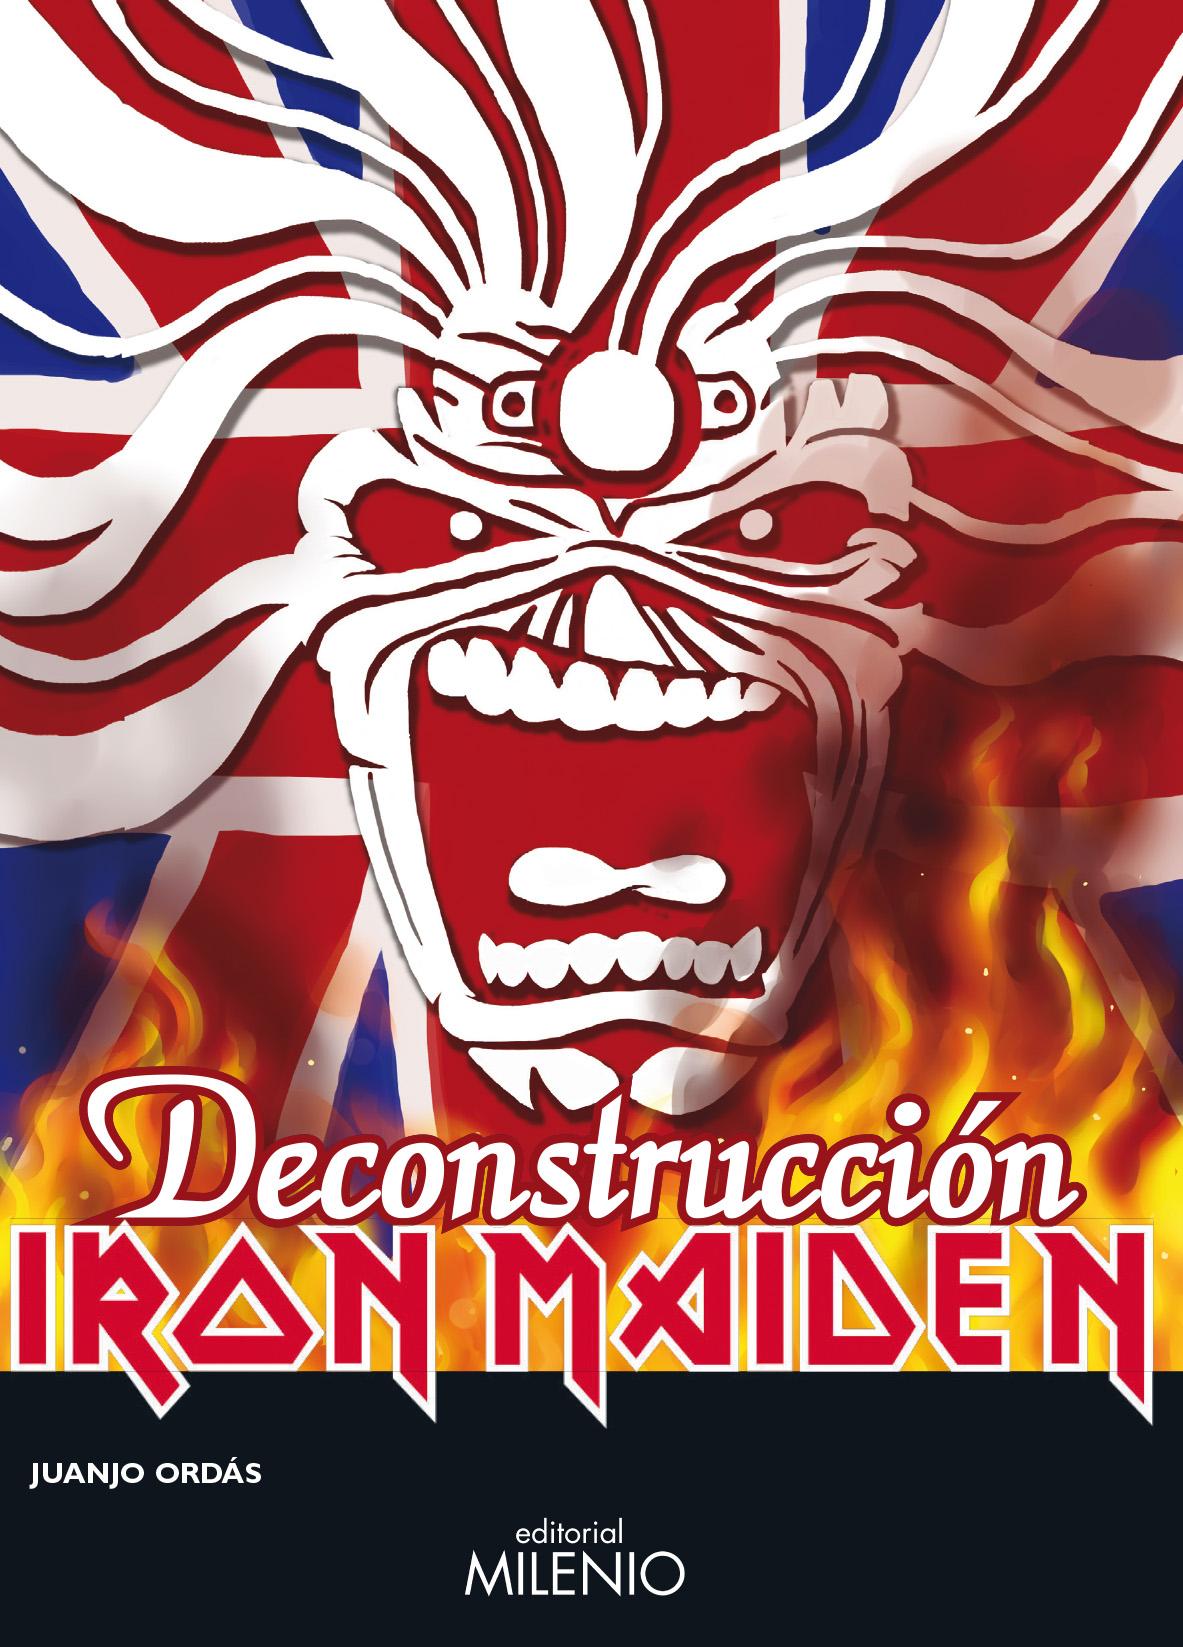 IRON MAIDEN DECONSTRUCCION